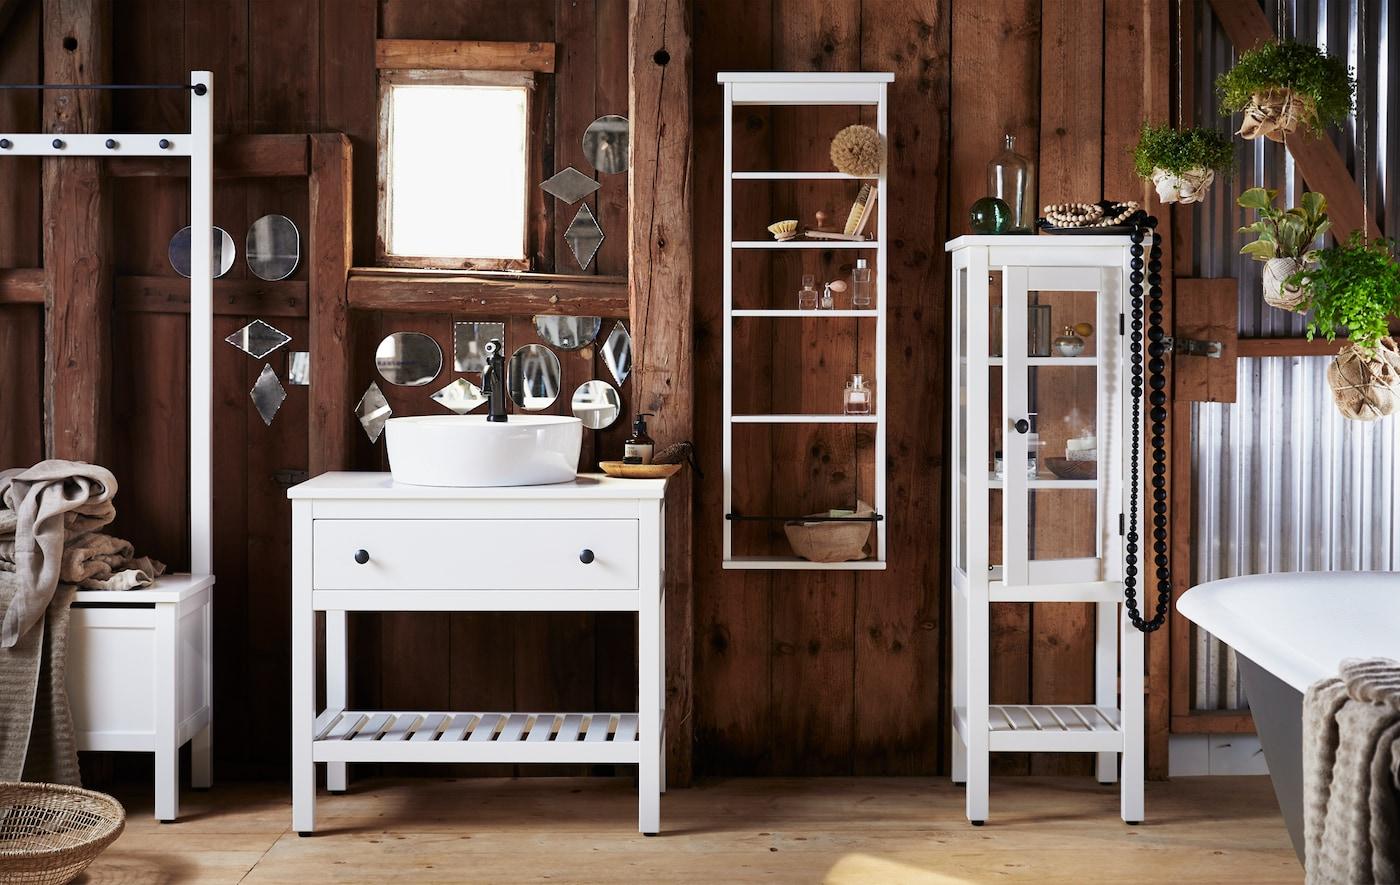 baderomsmøbler ikea